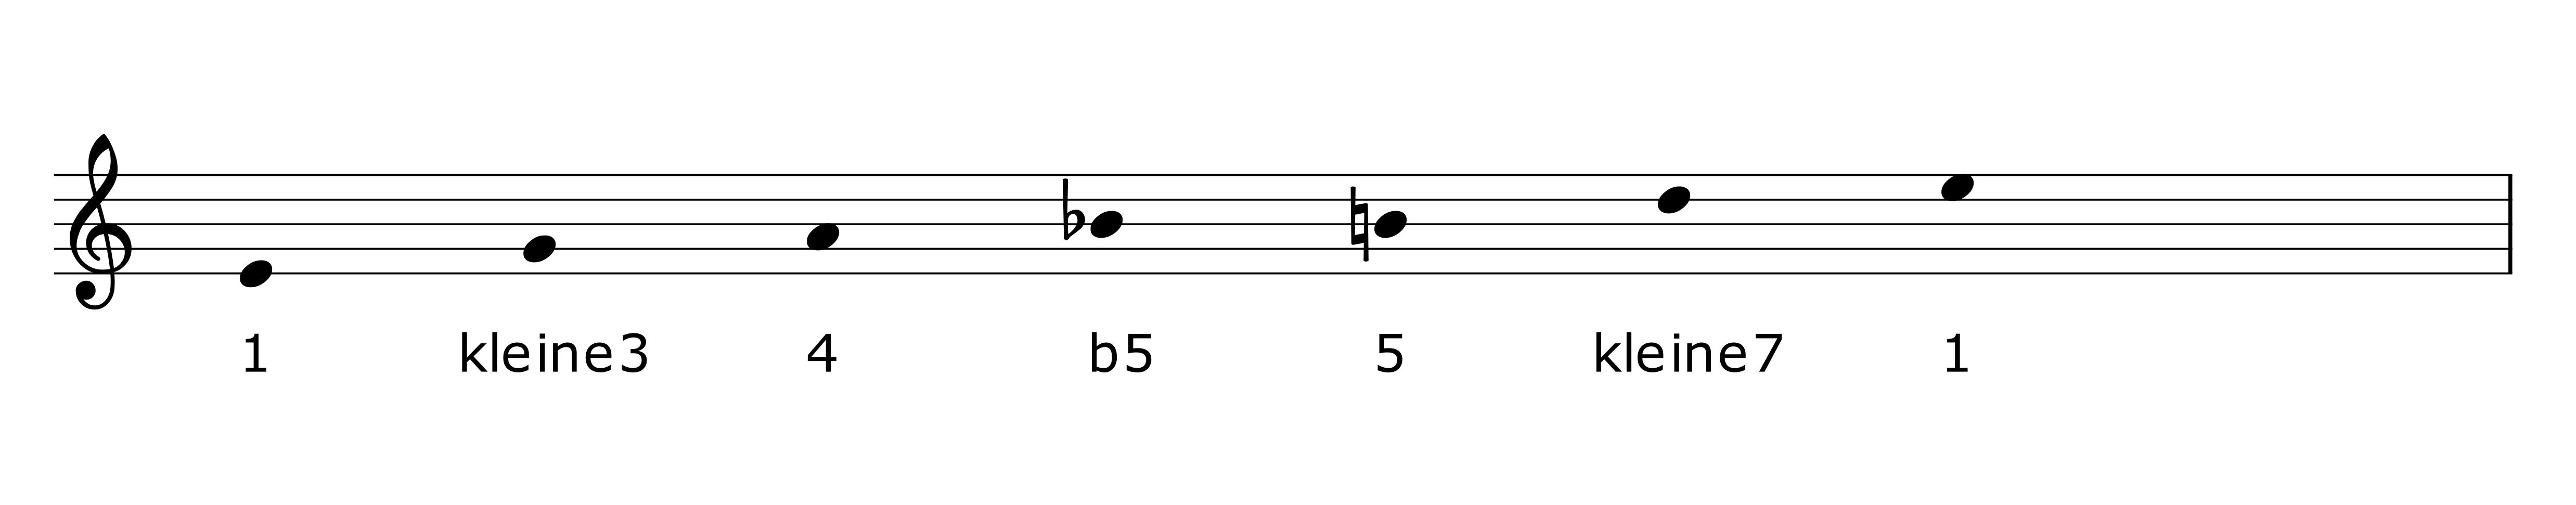 Bluestonleiter in E Seeheim-Jugenheim